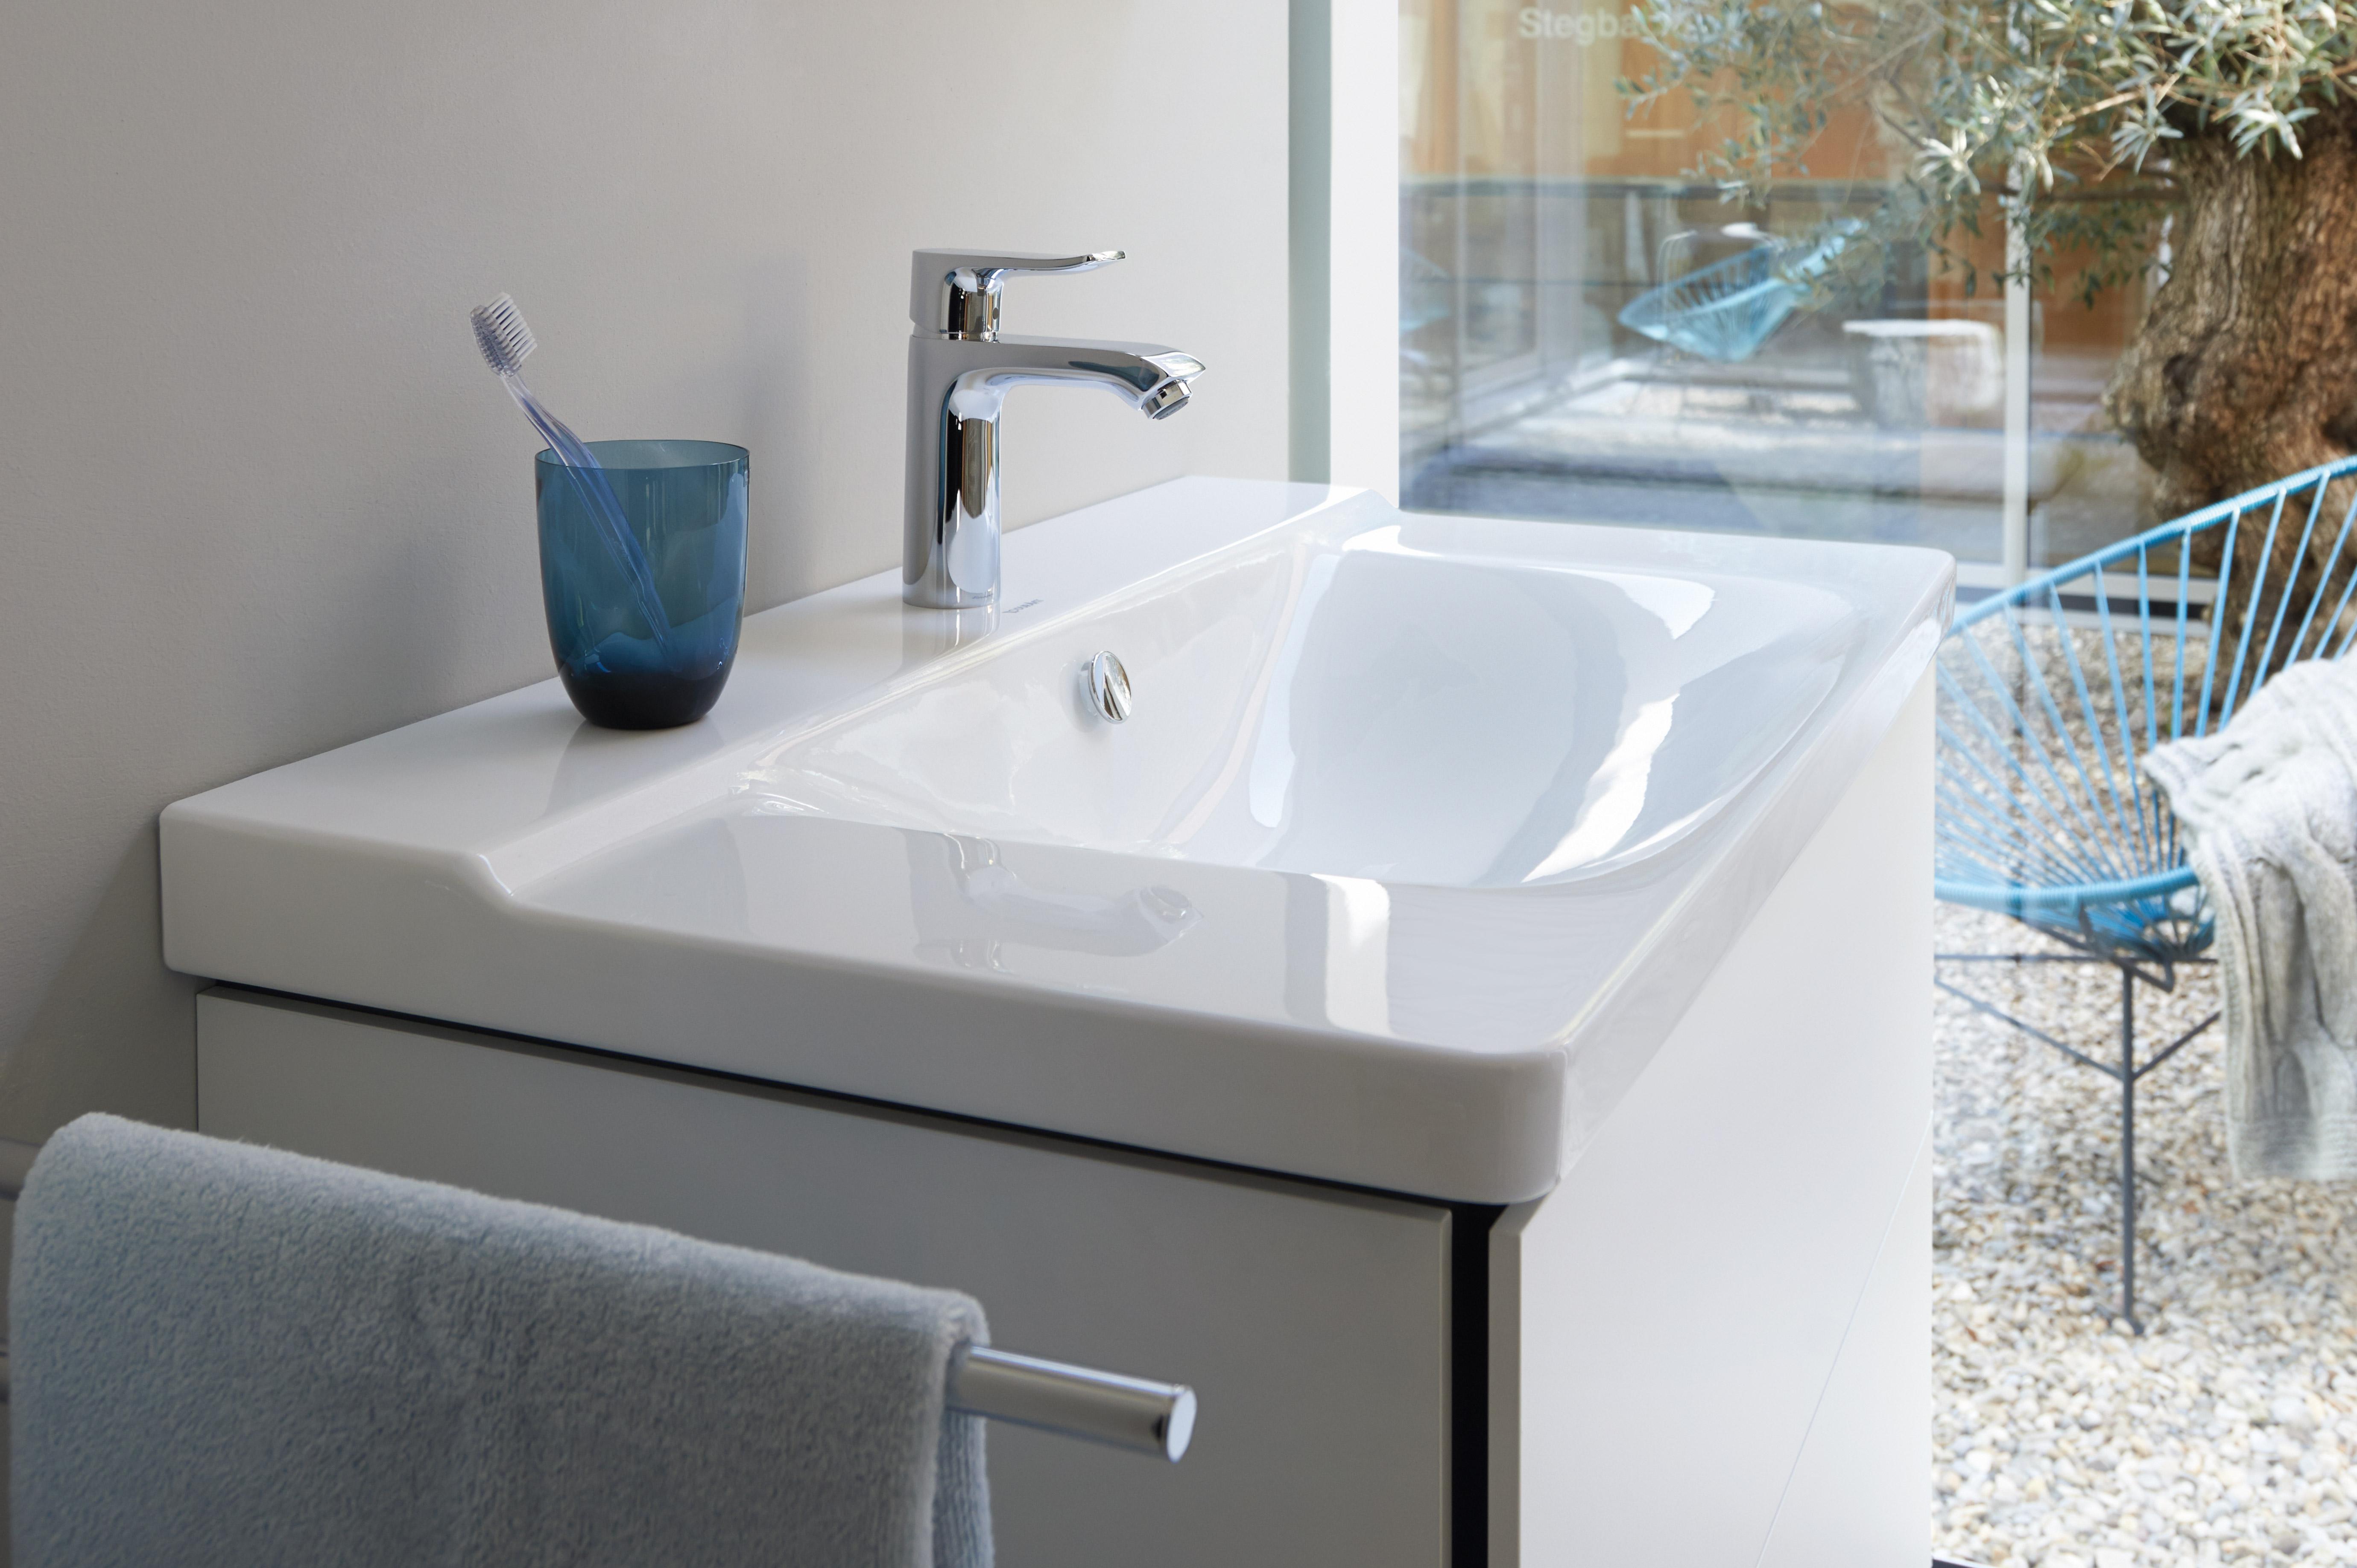 Modern bathroom sink cabinets vanities duravit - Duravit bathroom furniture uk ...